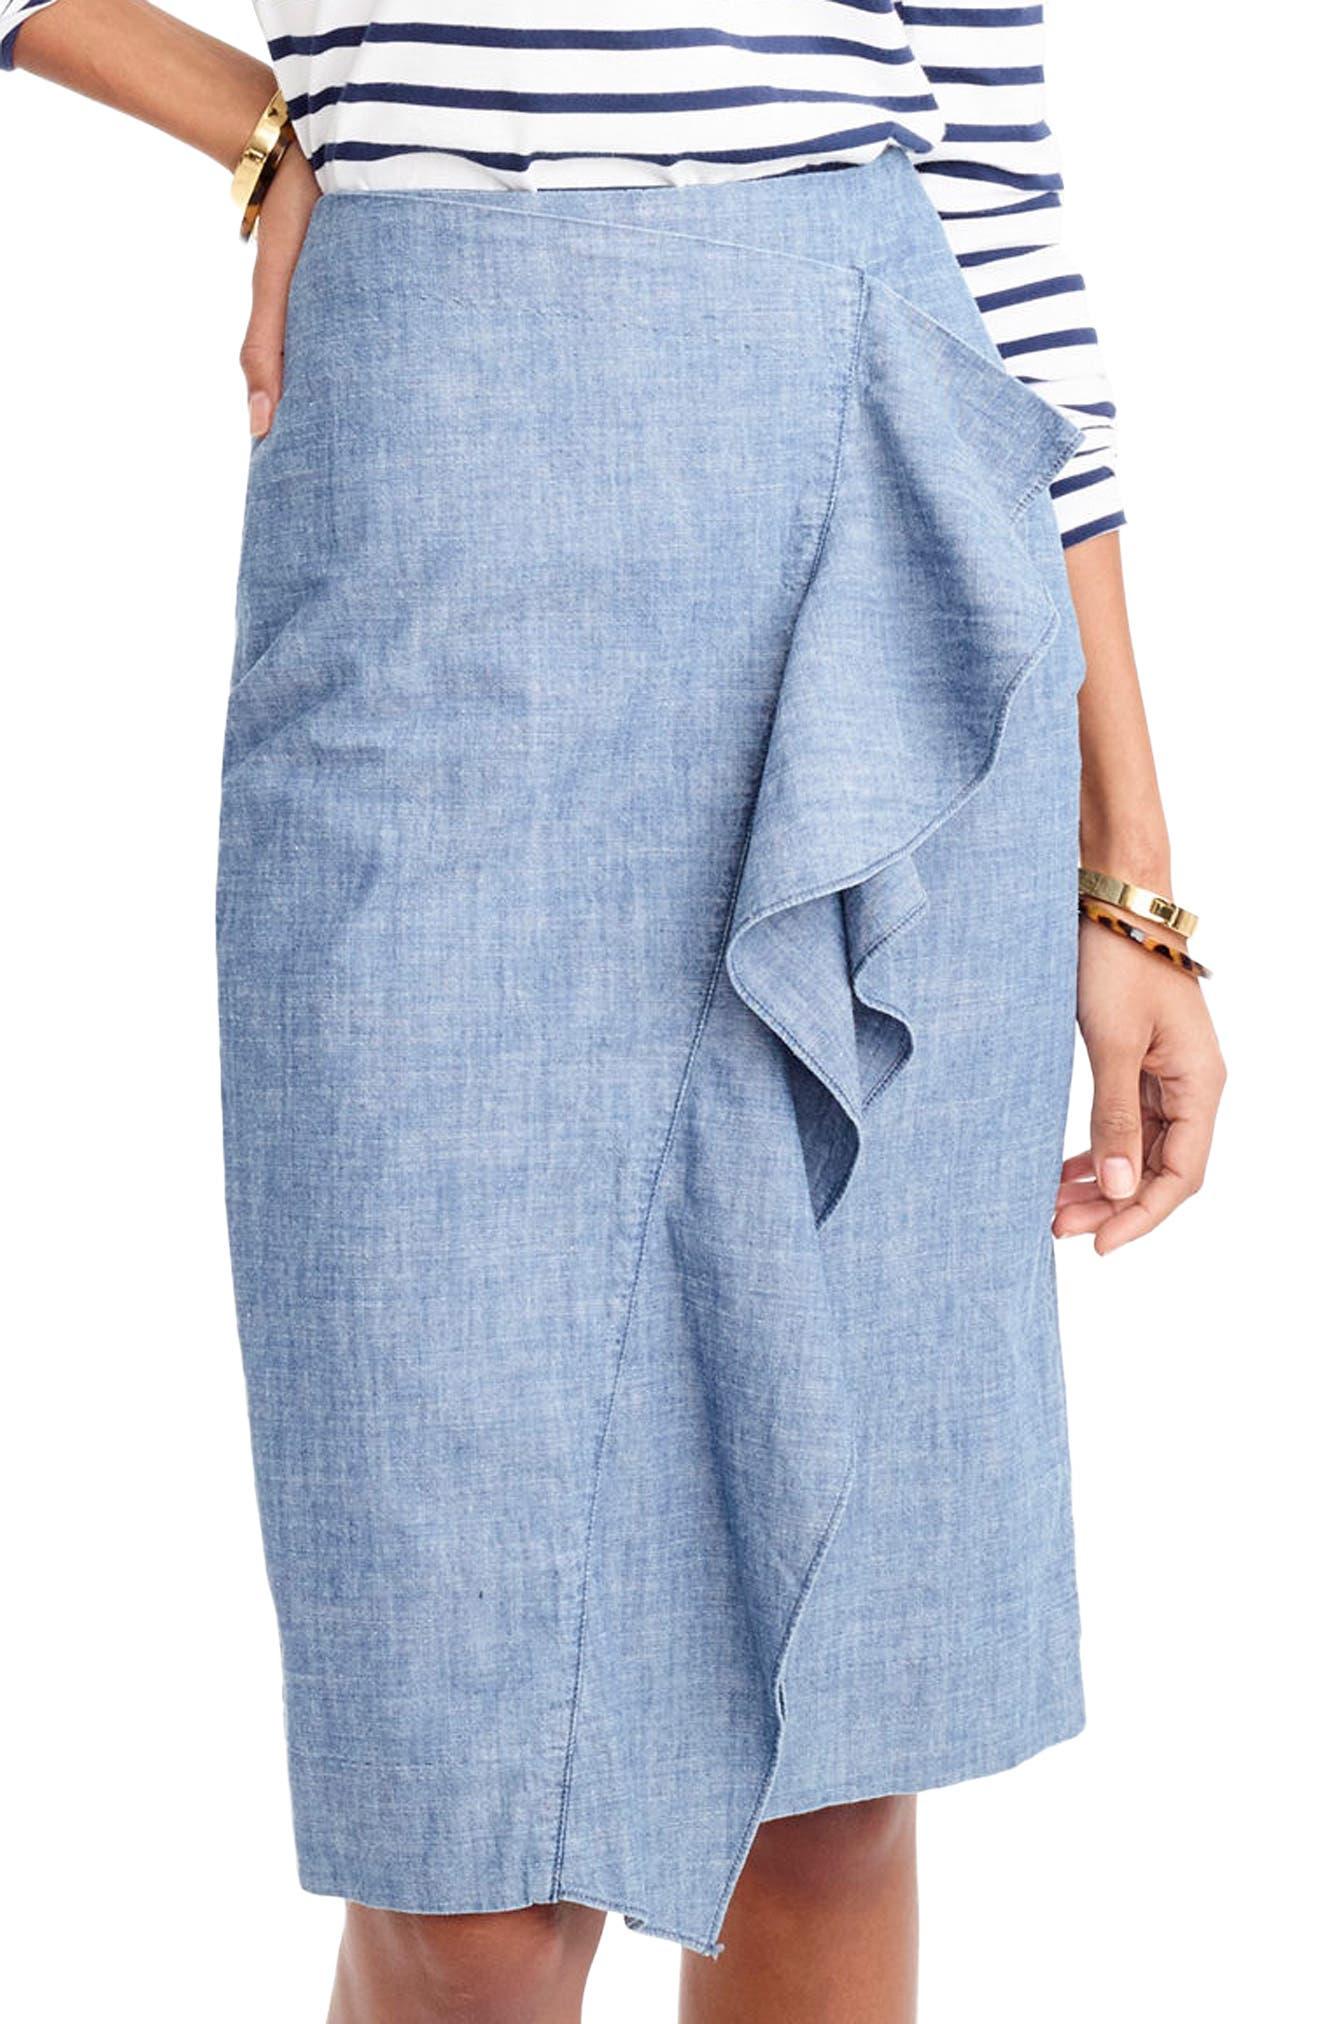 Chambray Ruffle Skirt,                         Main,                         color, Pale Indigo